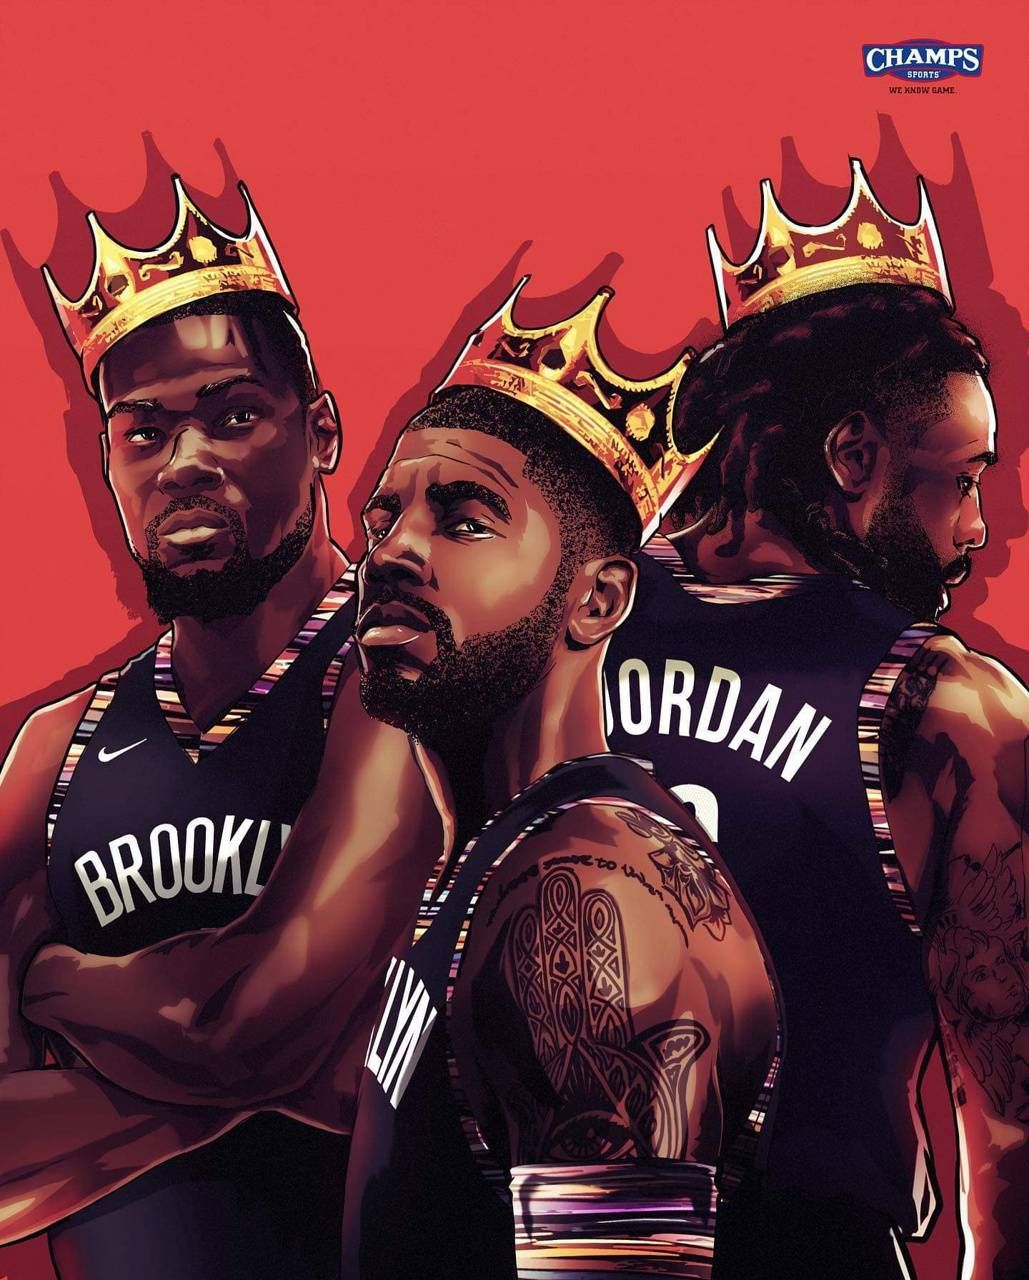 Kd And Kyrie Wallpaper : kyrie, wallpaper, Brooklyn, Kyrie, Kings, Biggie, Wallpaper, Basketball, Players